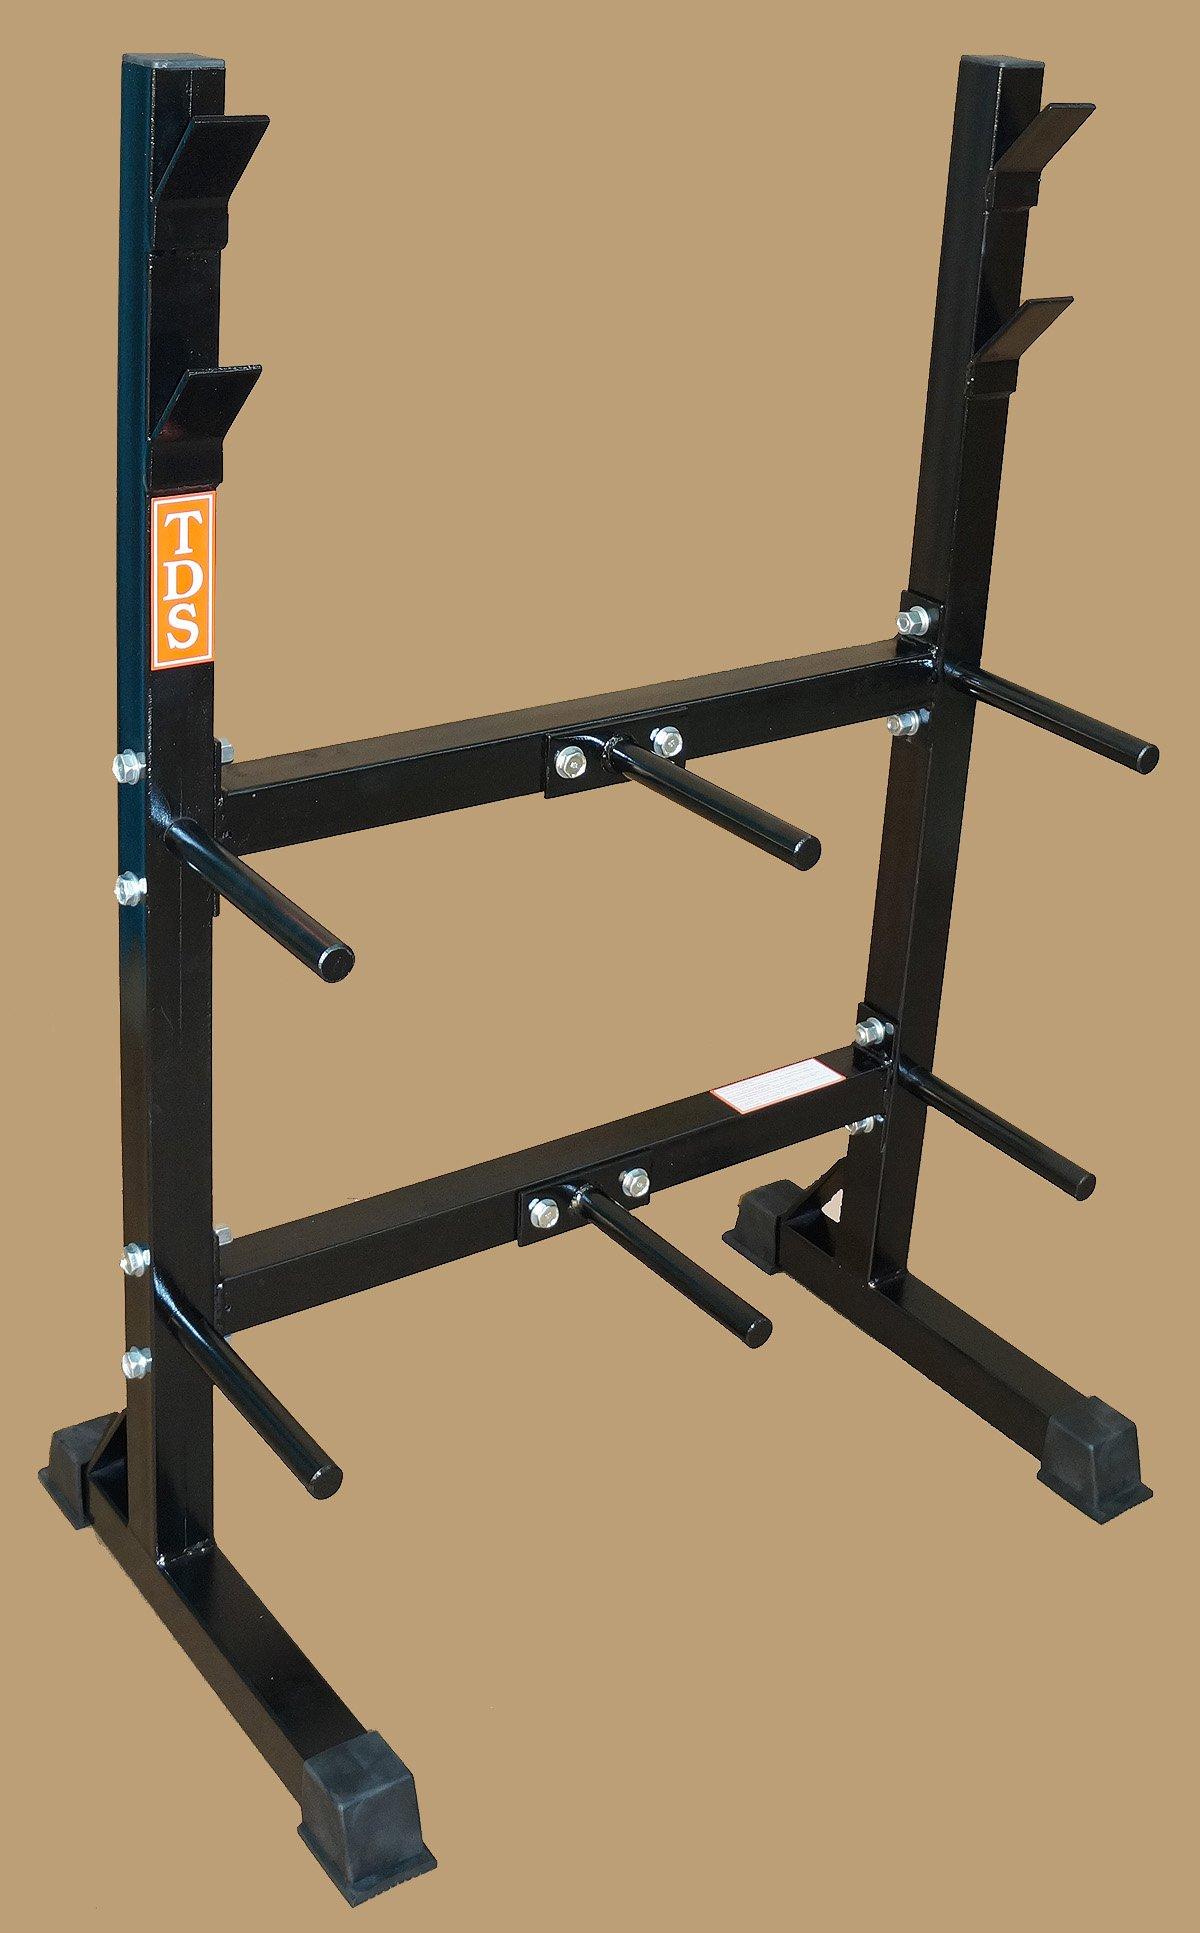 Front Loading Rack System for Standard Plates & Bars